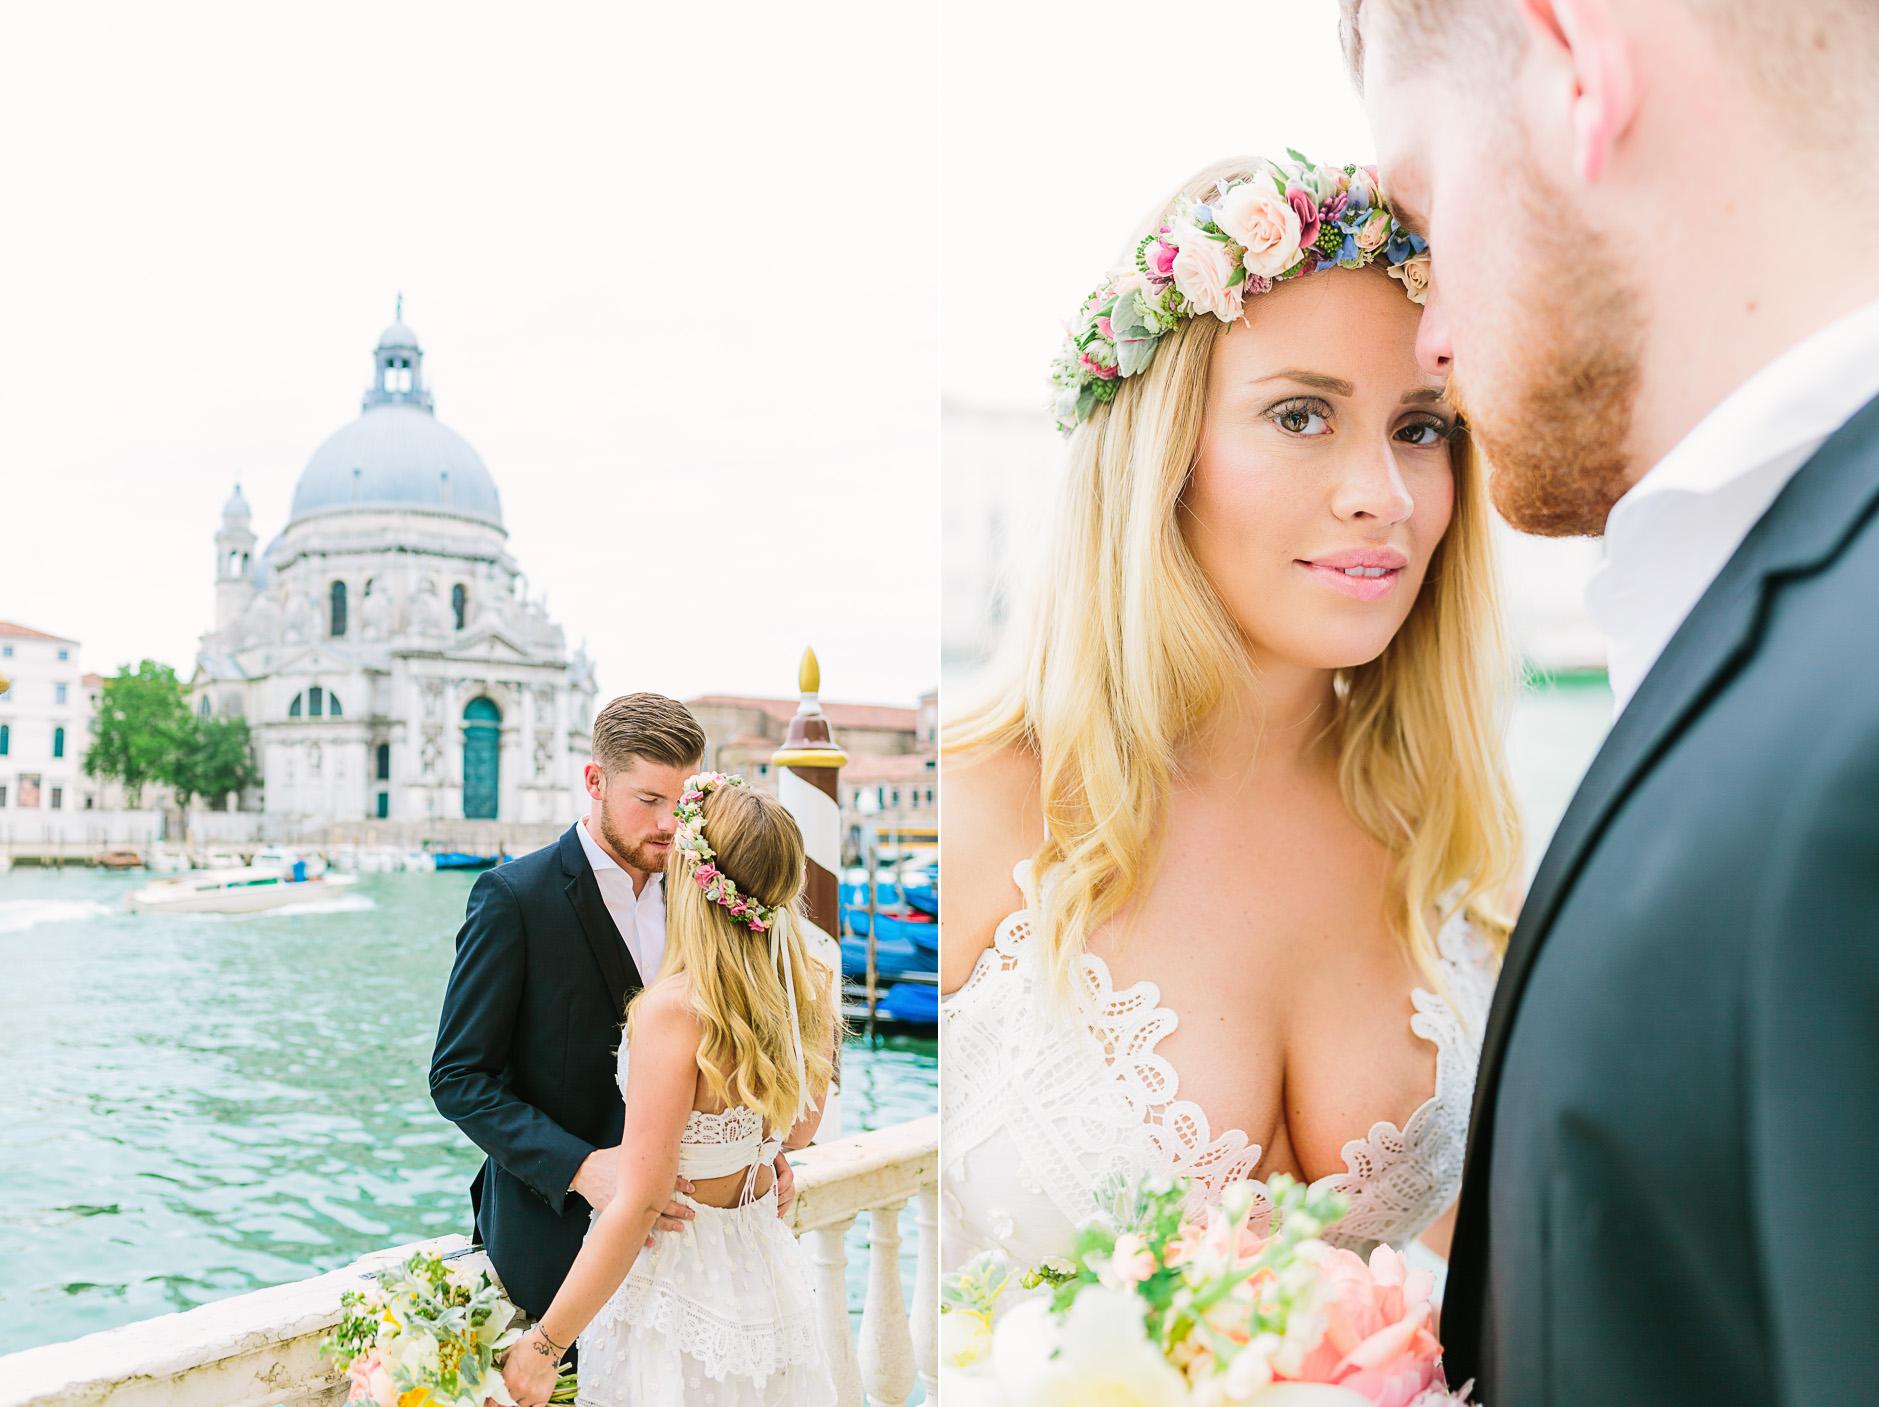 Hochzeitsfotograf Le Hai Linh Boho Chic After Wedding Shooting Venedig Timo Horn 1.FC Koeln 028.jpg